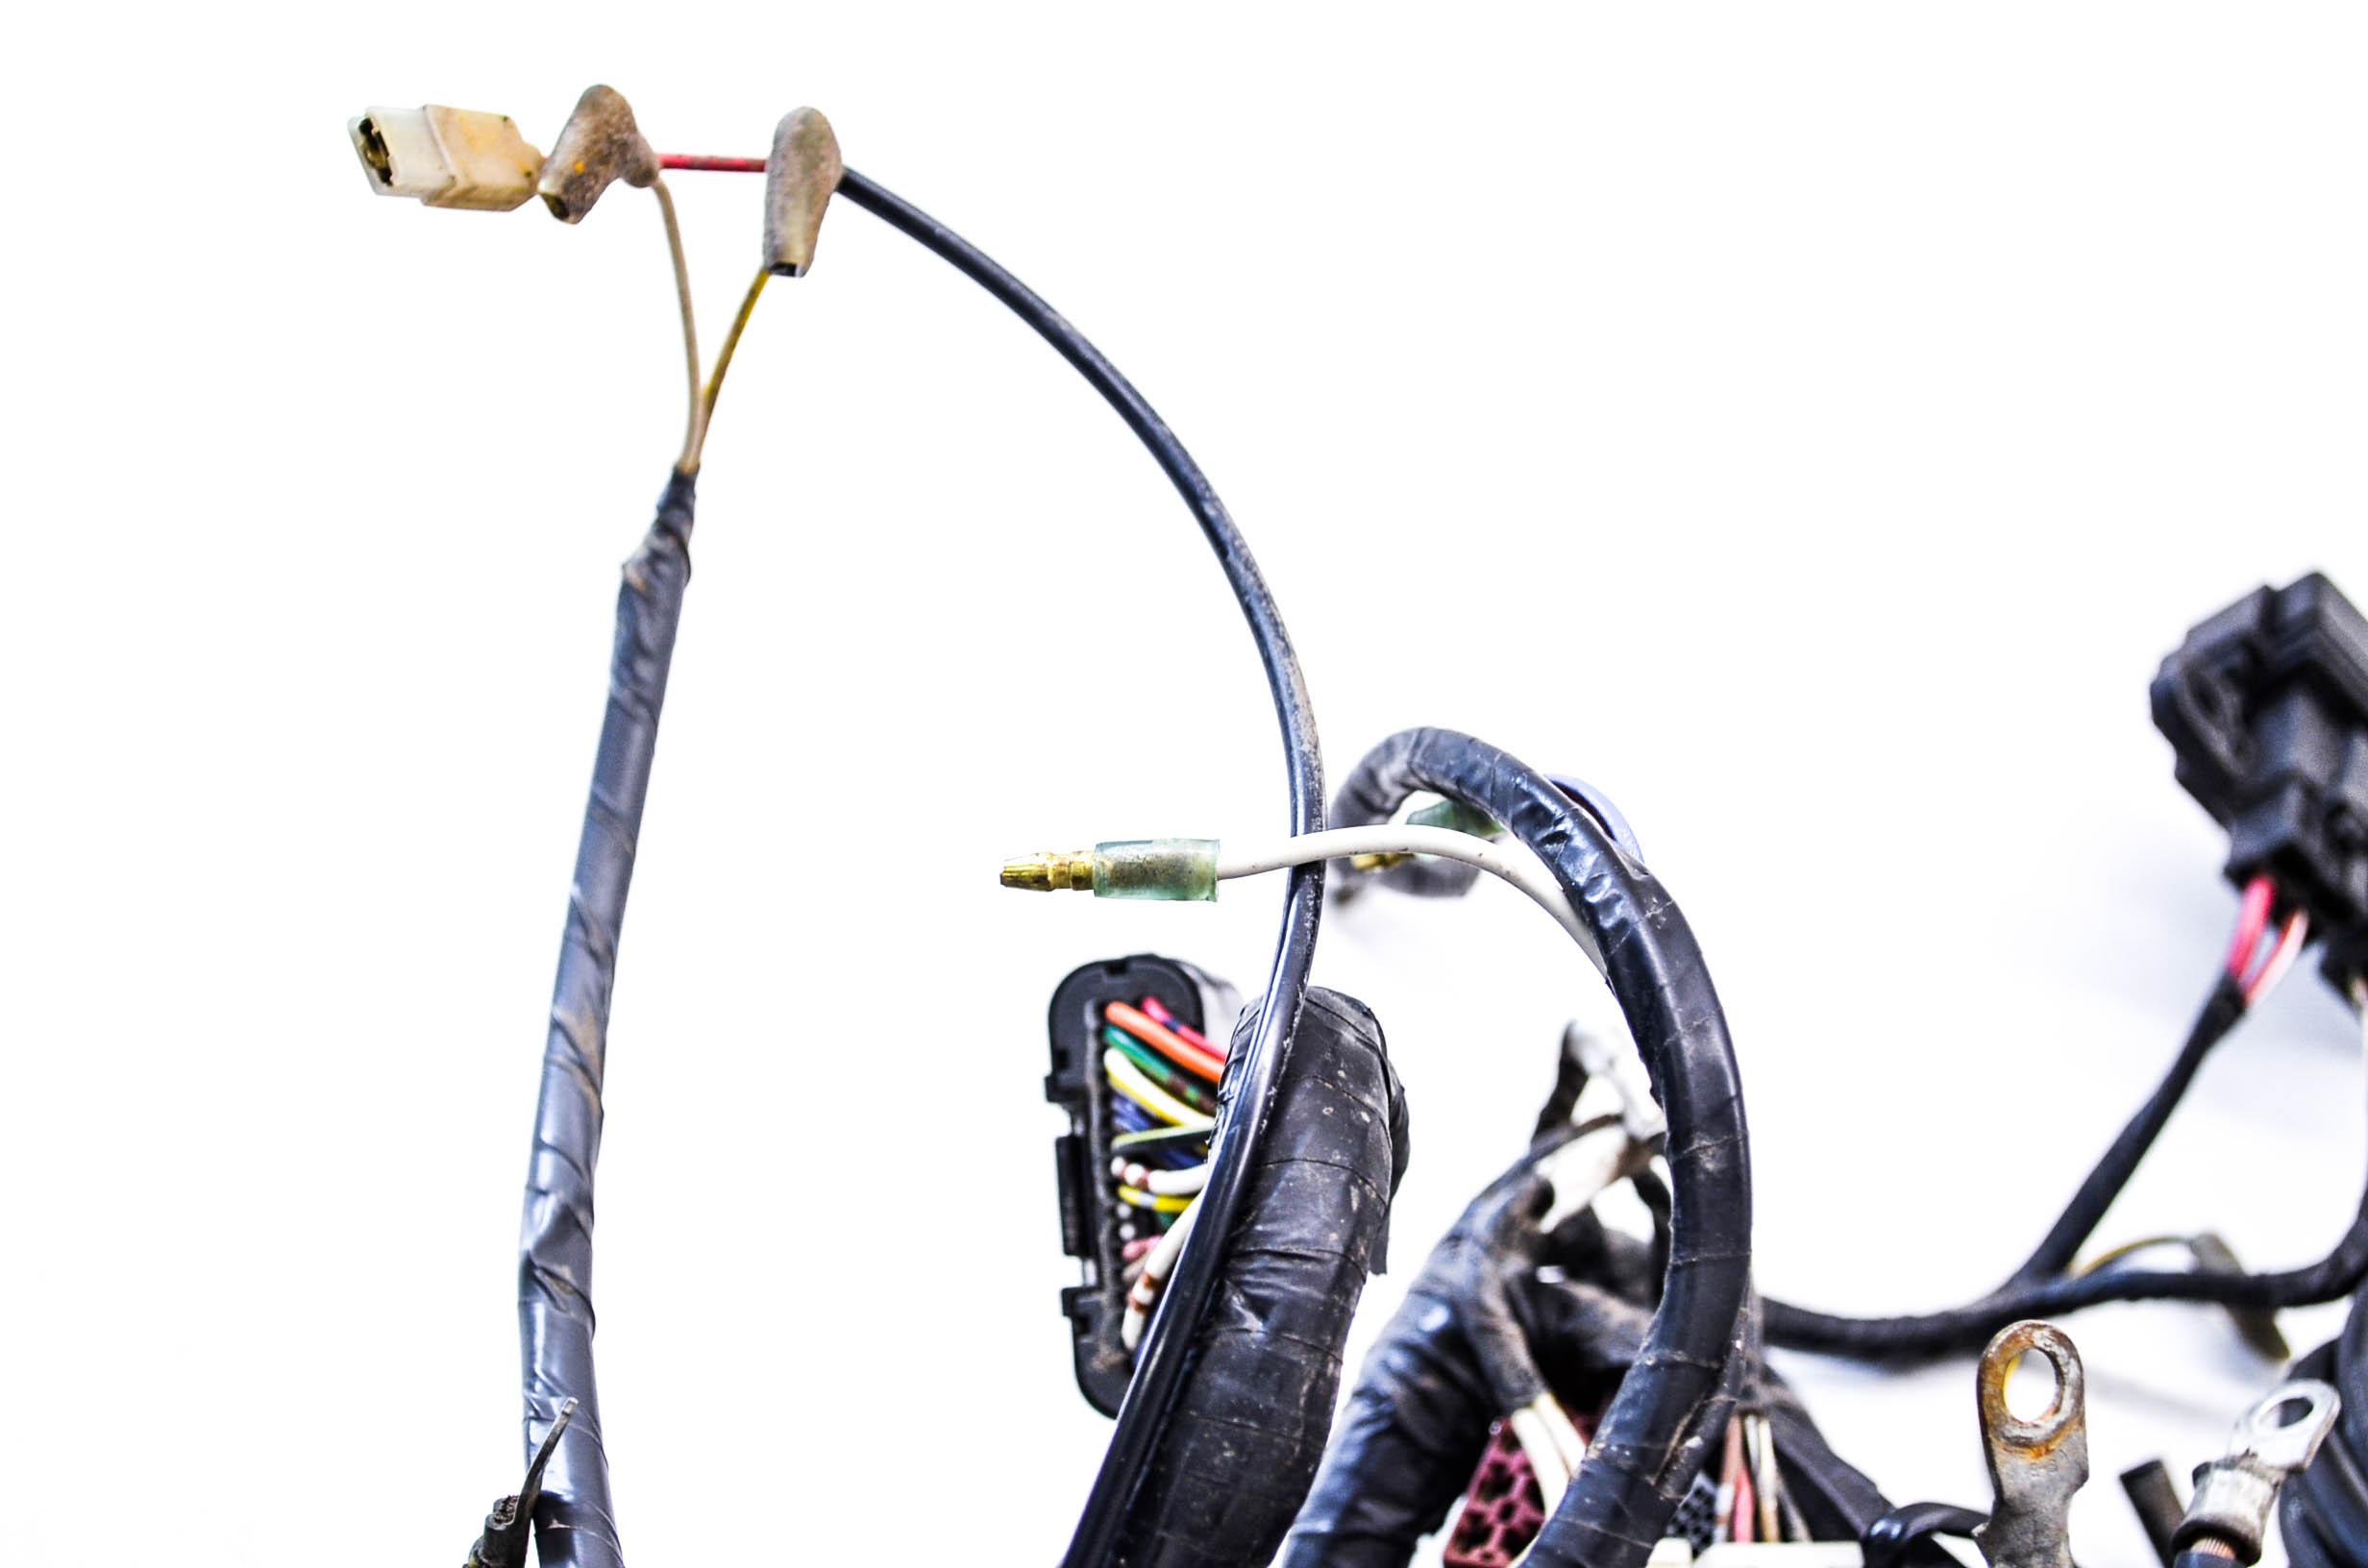 Kawasaki 4010 Electrical Wiring Harness Just Another Data Taylor Dunn 10 Mule 4x4 Wire Kaf620 Ebay